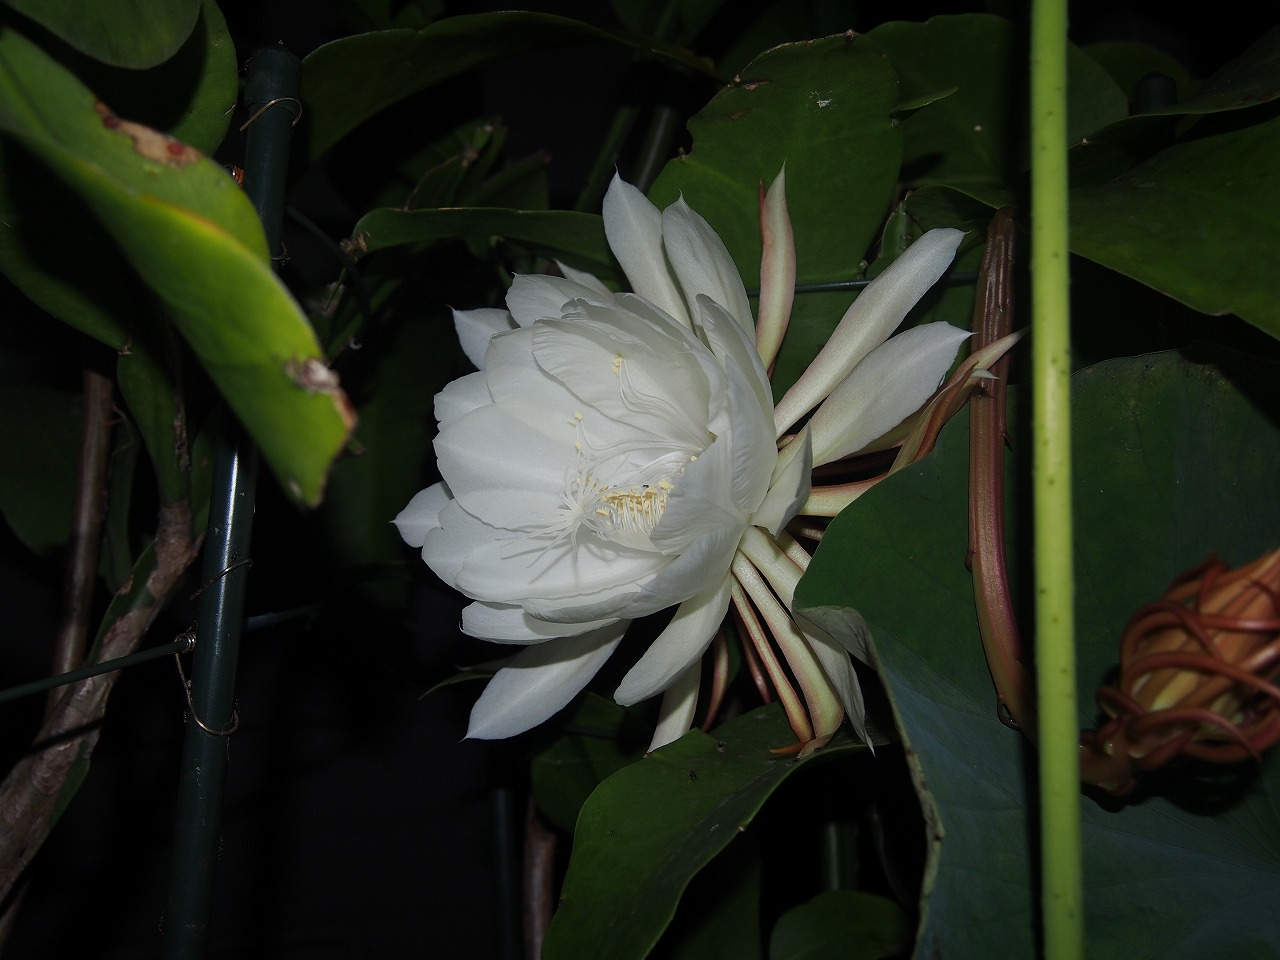 20170705-EpiphyllumOxpetalum-O10.jpg